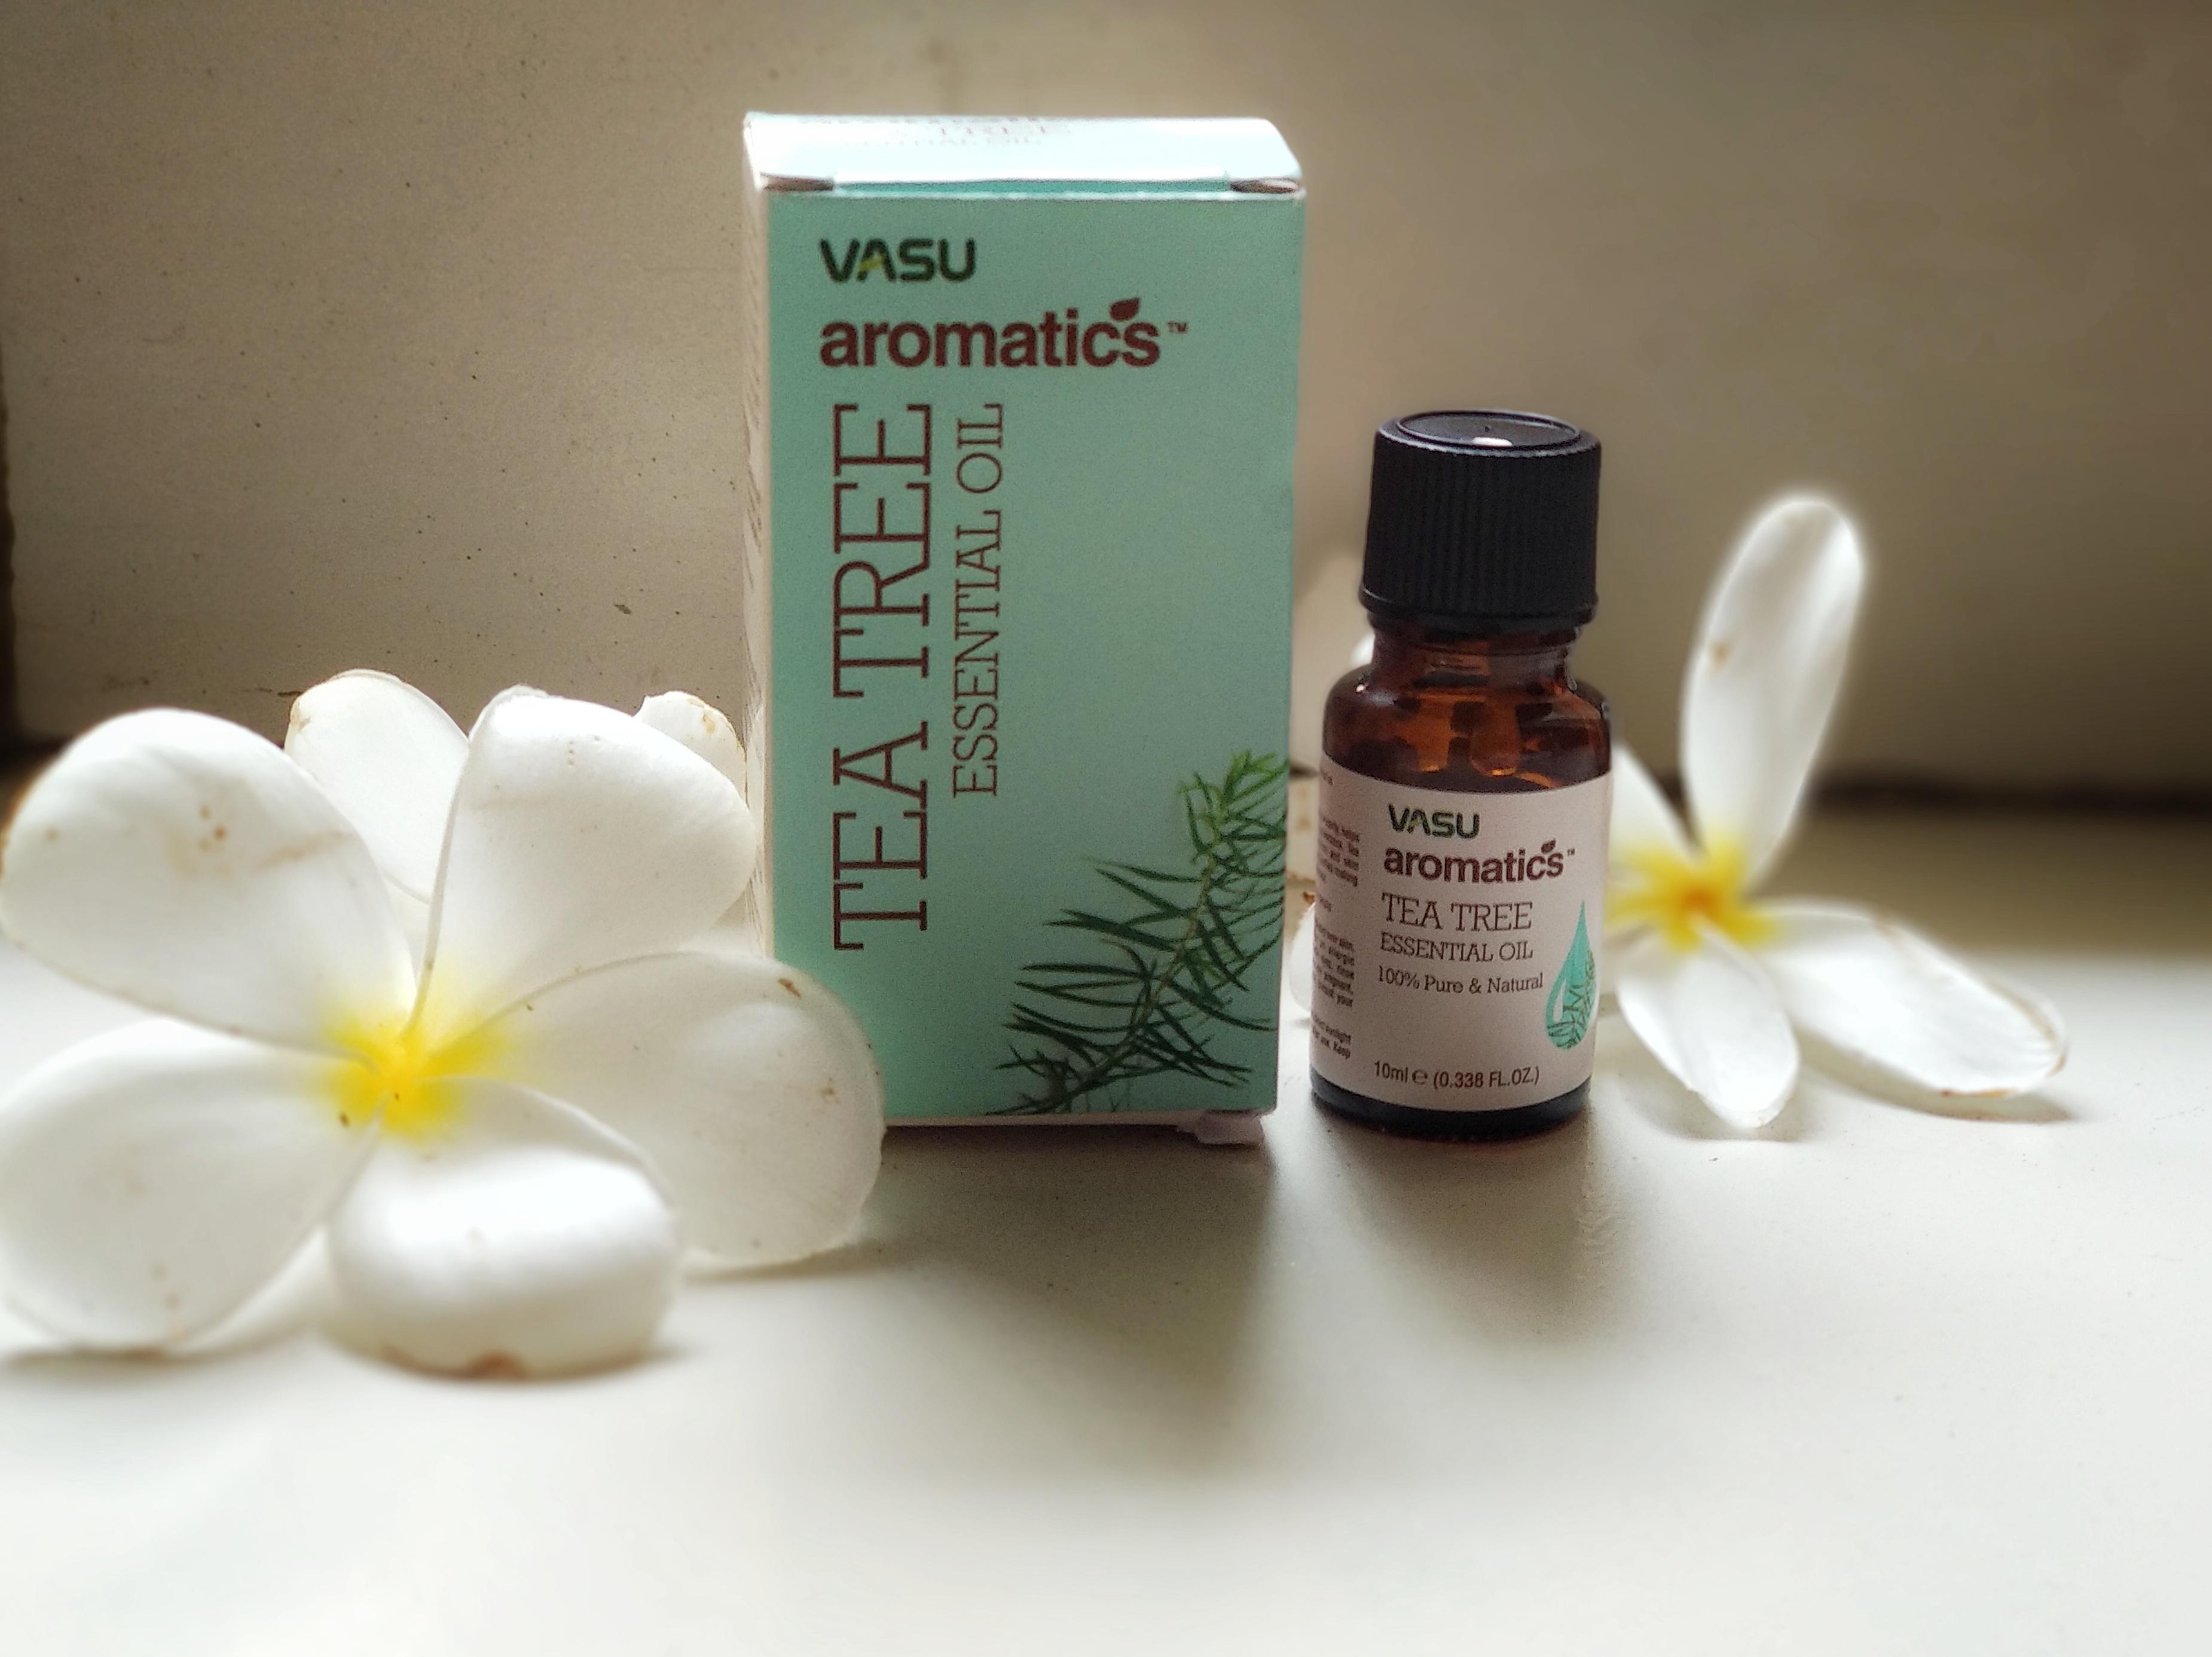 Vasu Aromatics Tea Tree Essential Oil-Very Much Effective!-By debolina_sen-3